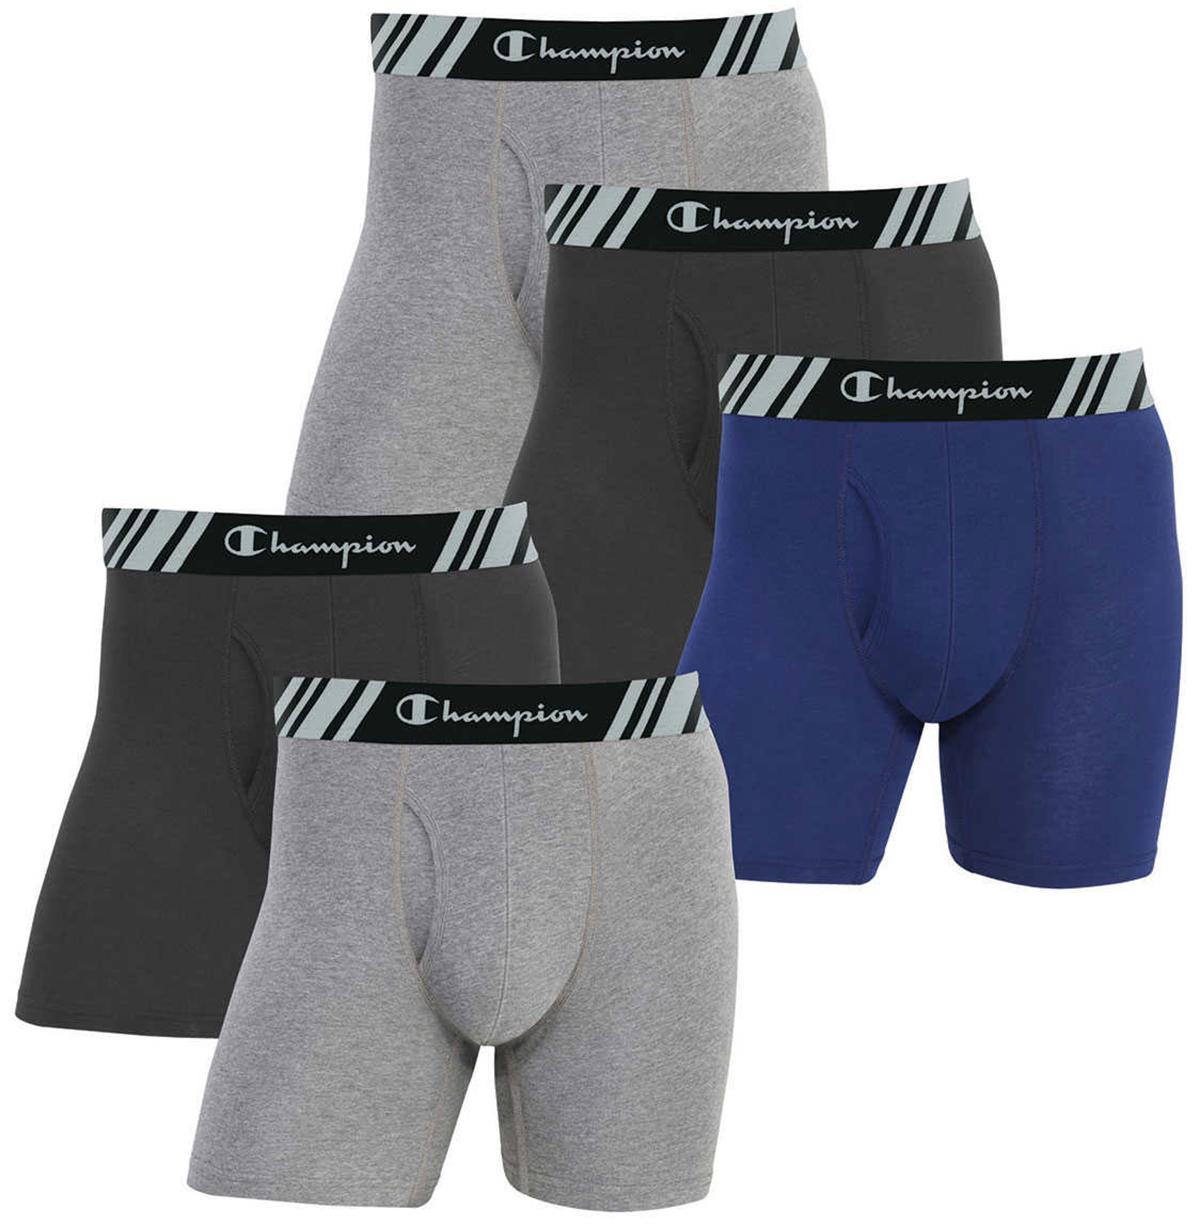 Champion Men's 5 Pack Smart Temp Boxer Brief - New 5 Value Pack - Multi Color - Medium